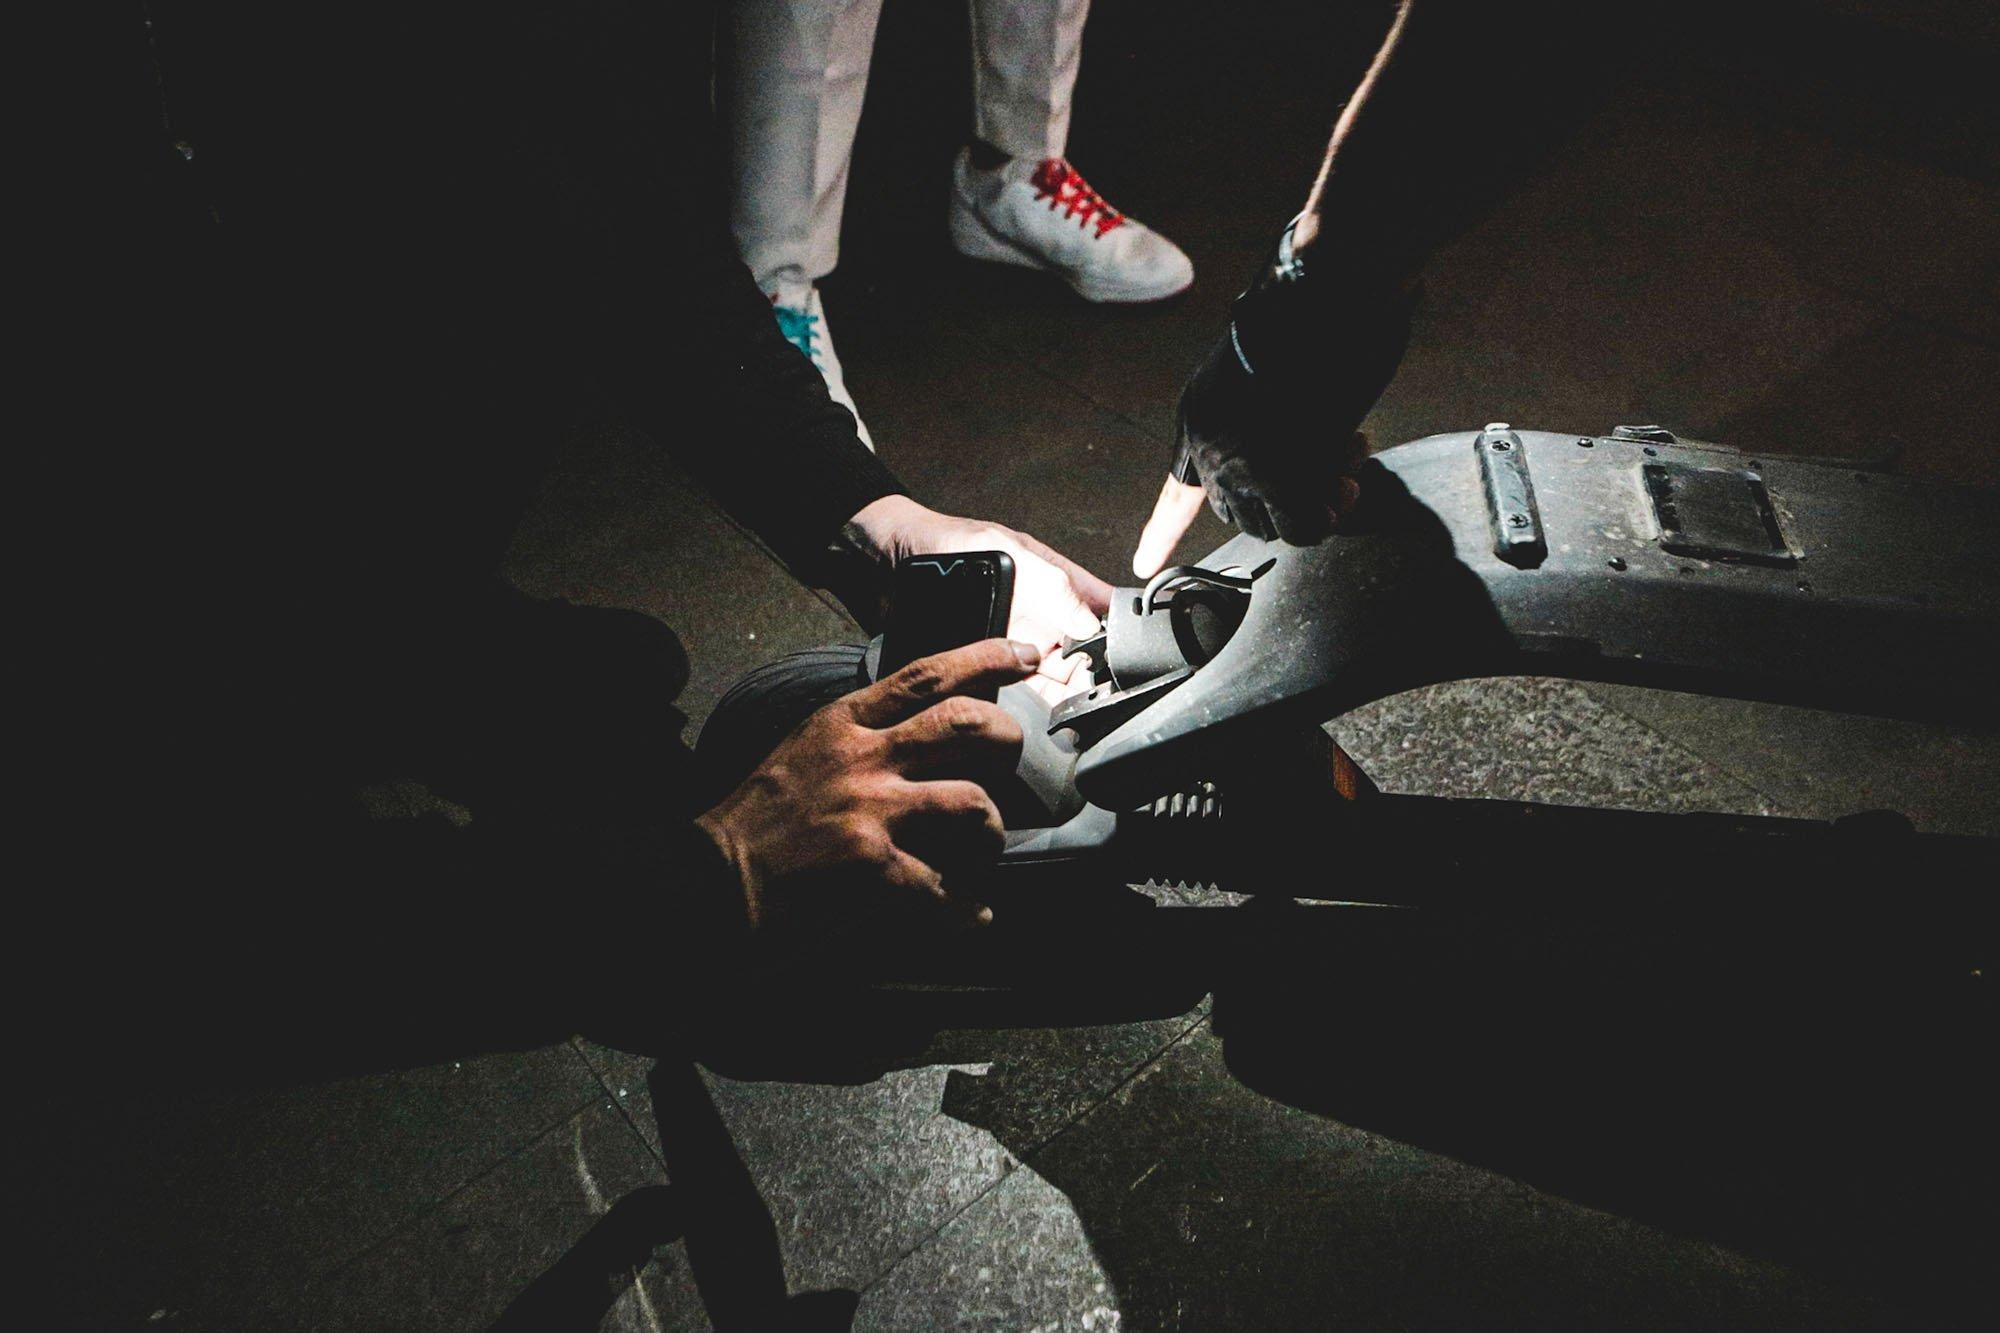 Pengguna skuter listrik memeriksa tunggangannya sebelum berkendara di Kemang, Jakarta (9/11/2019). Skuter listrik menjadi bagian peralihan kendaraan berbahan bakar minyak menjadi bertenaga listrik dengan emisi nol.